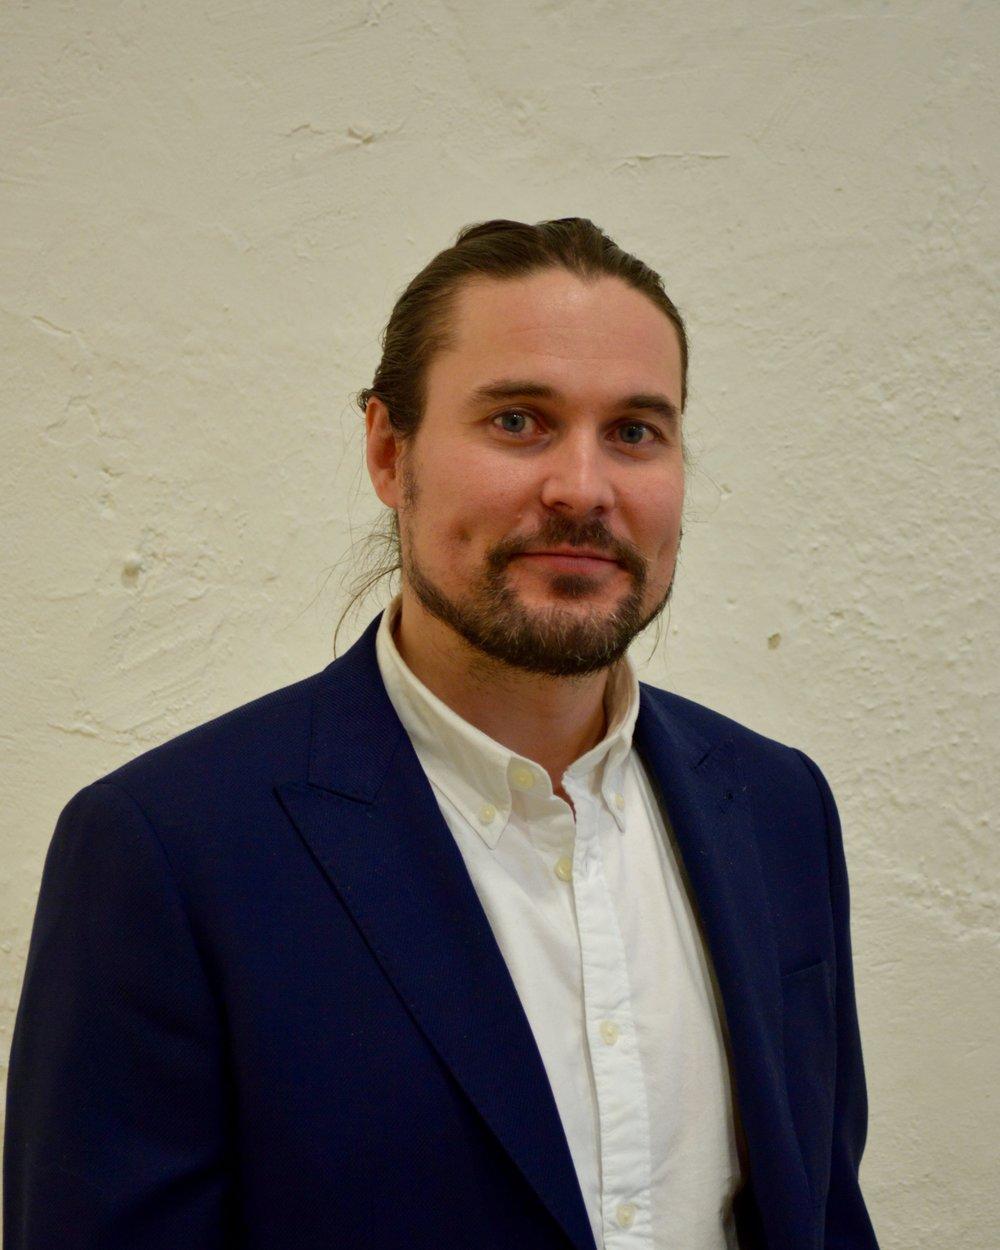 Mikko HyökkiSosionomi AMK; perhe- ja psykoterapeutti.Perheterapia ja parisuhdeterapia,mikko(at)tyodynamo.fi  -